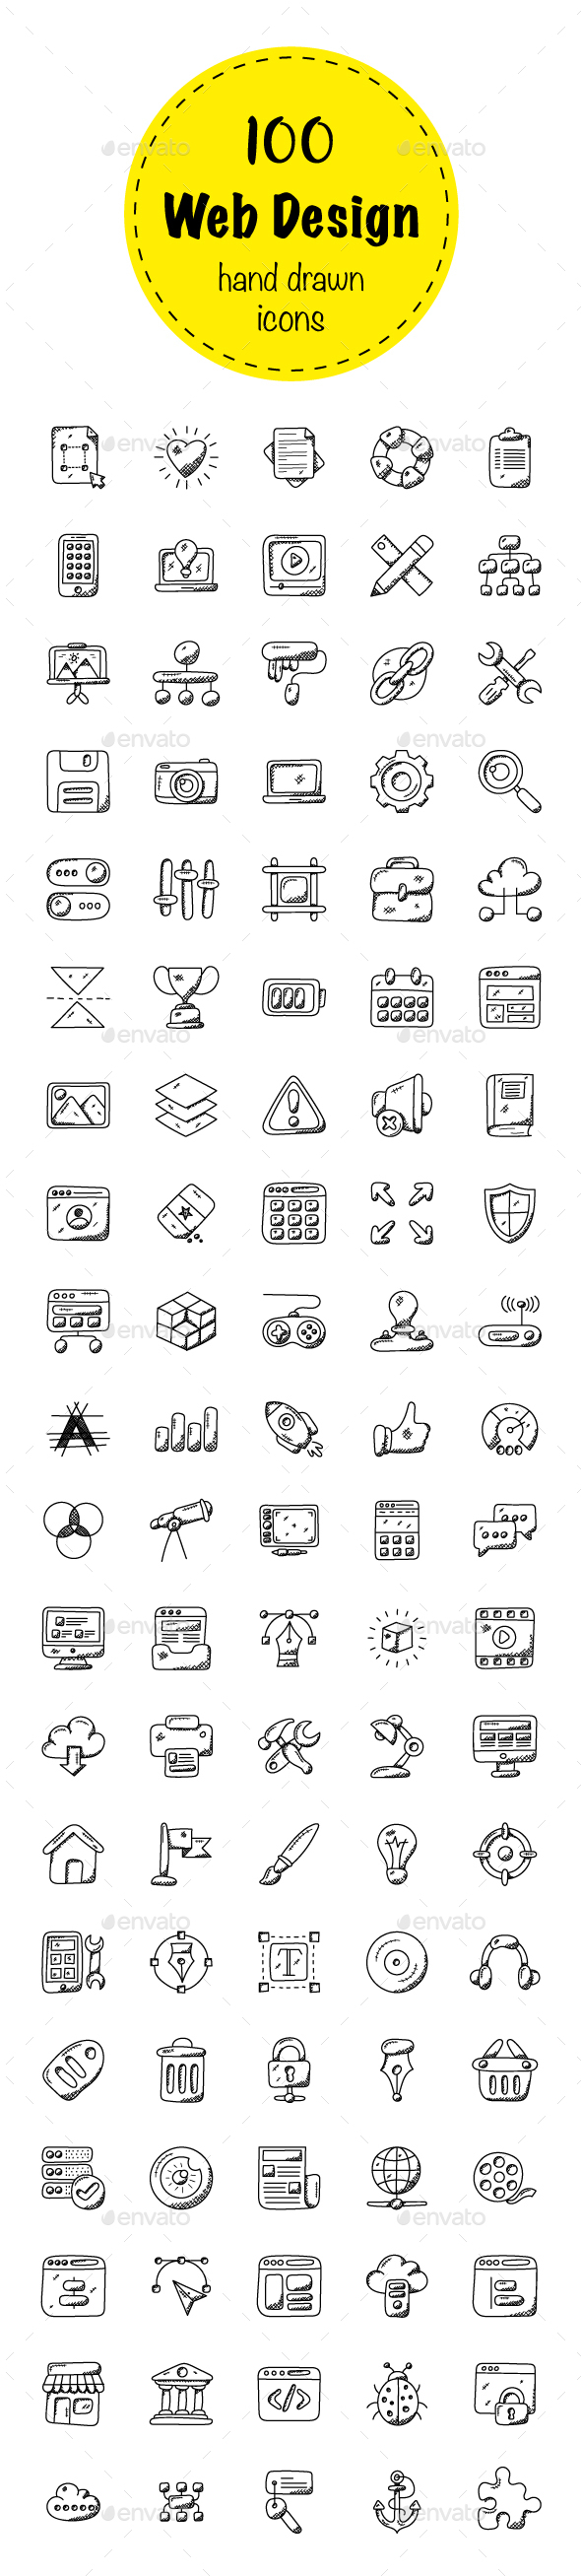 100 Web Design Doodle Icons - Icons